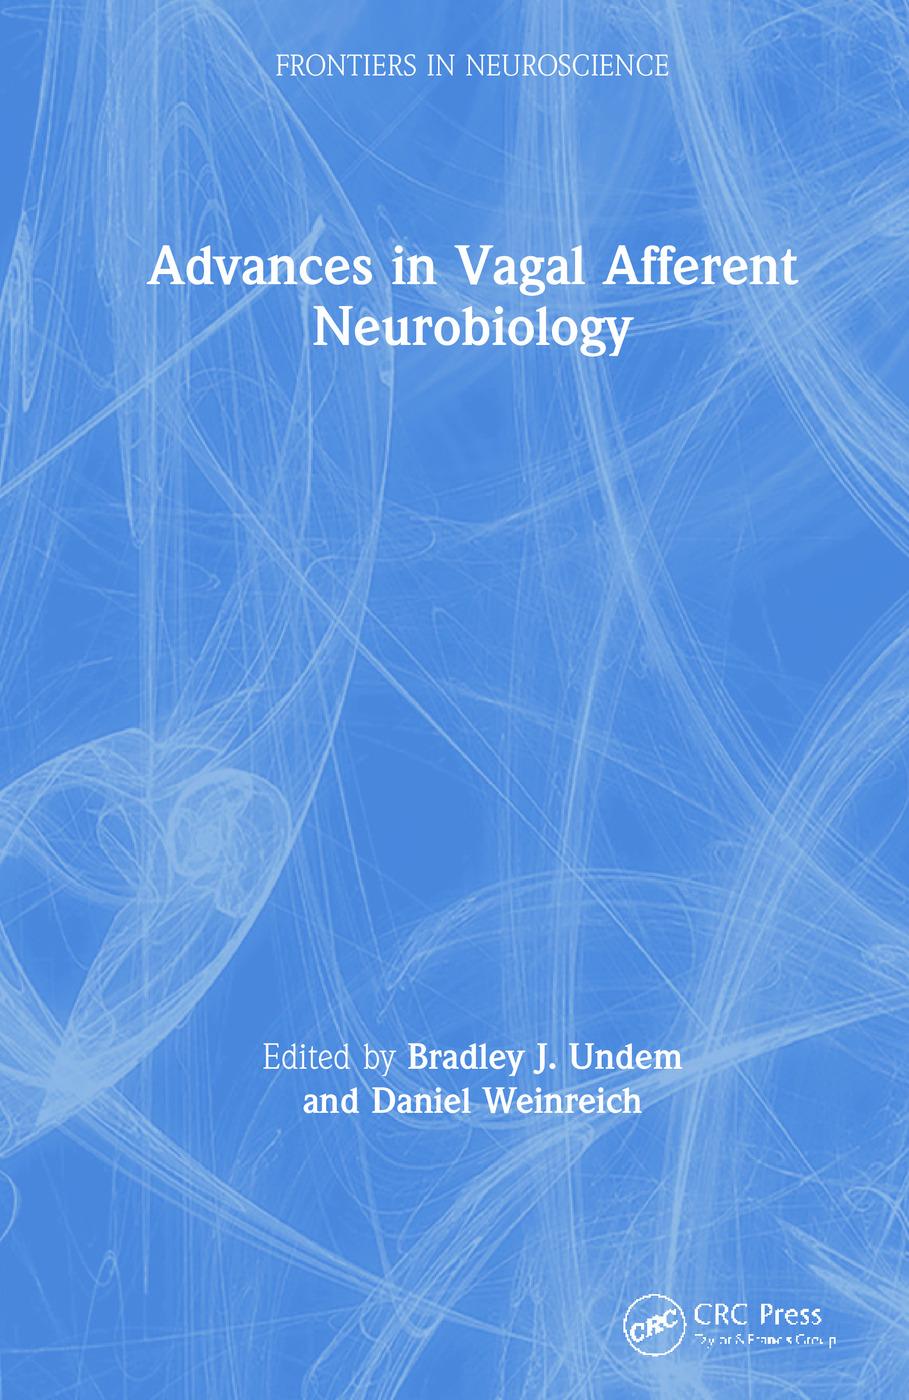 Advances in Vagal Afferent Neurobiology: 1st Edition (Hardback) book cover